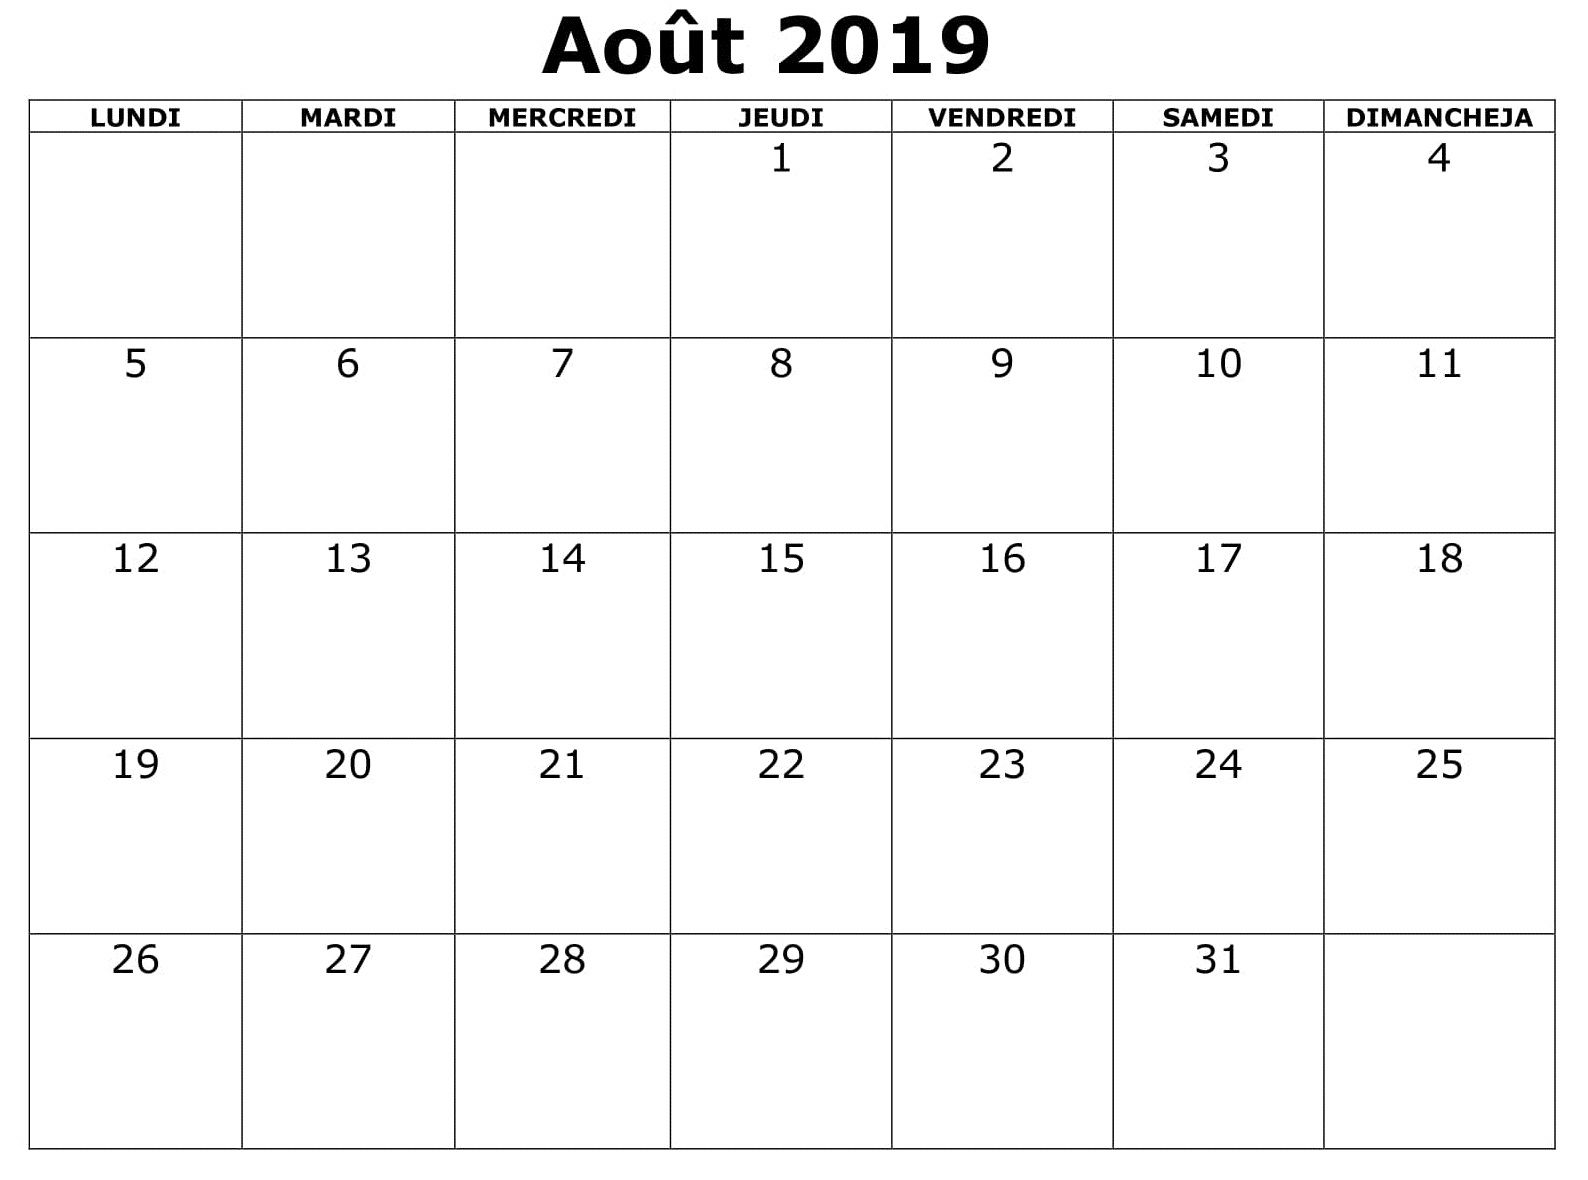 Template Calendrier 2019.Aout Calendrier 2019 A Imprimer Excel April Calendar